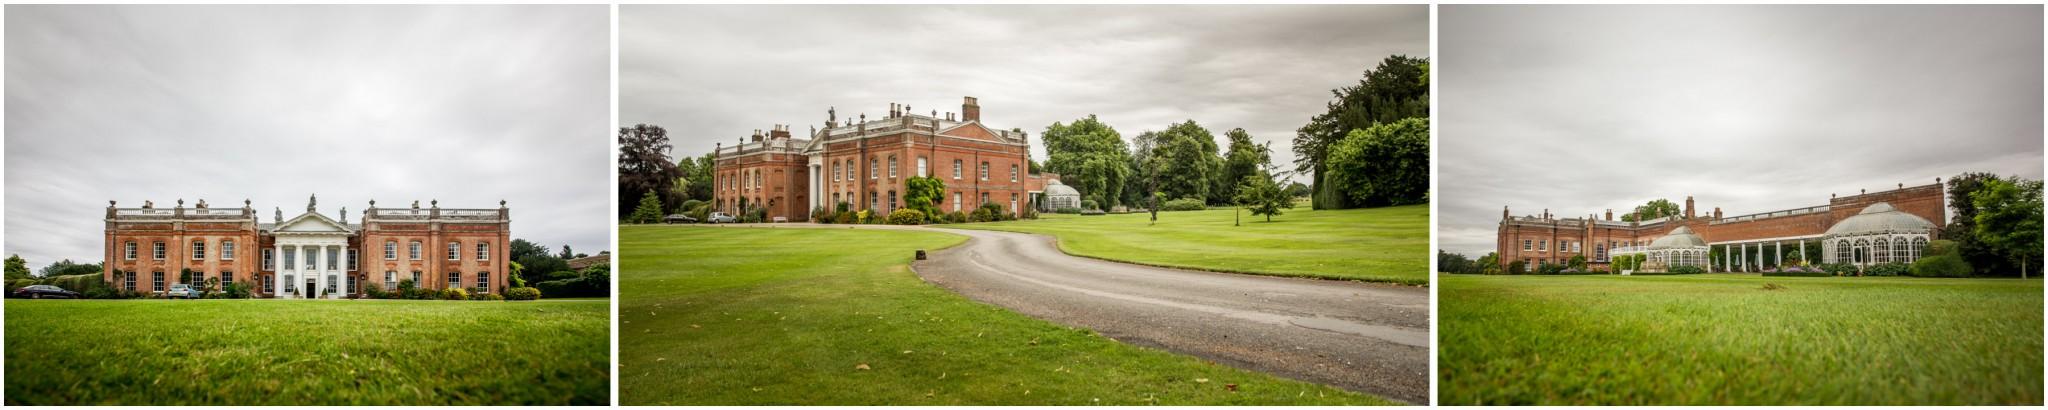 Avington Park Wedding Exterior Shots